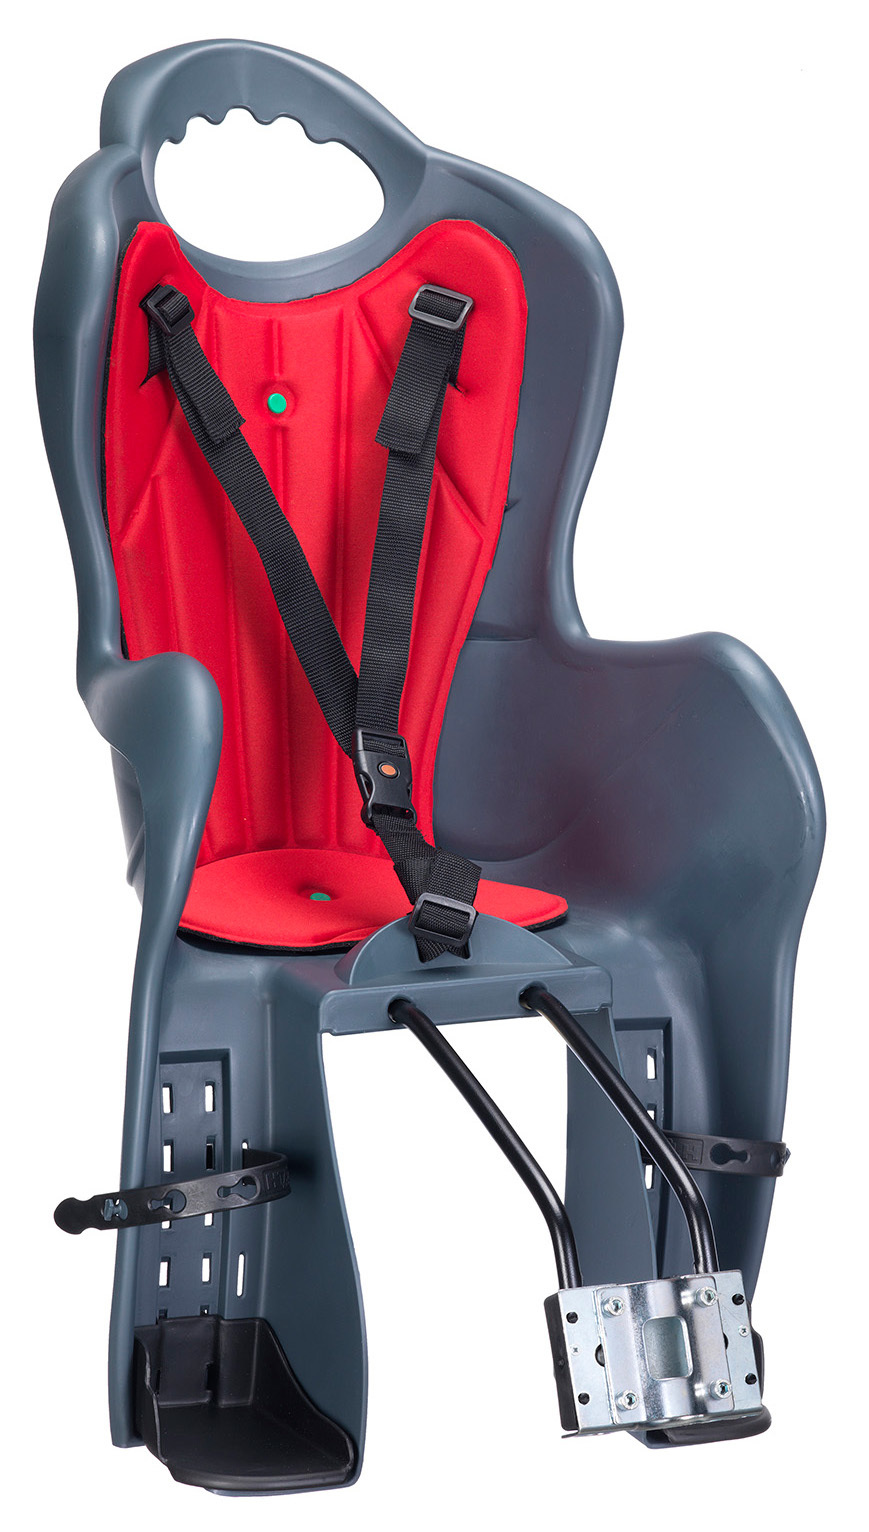 fahrrad kindersitz fahrradsitz kinderfahrradsitz r cksitz. Black Bedroom Furniture Sets. Home Design Ideas